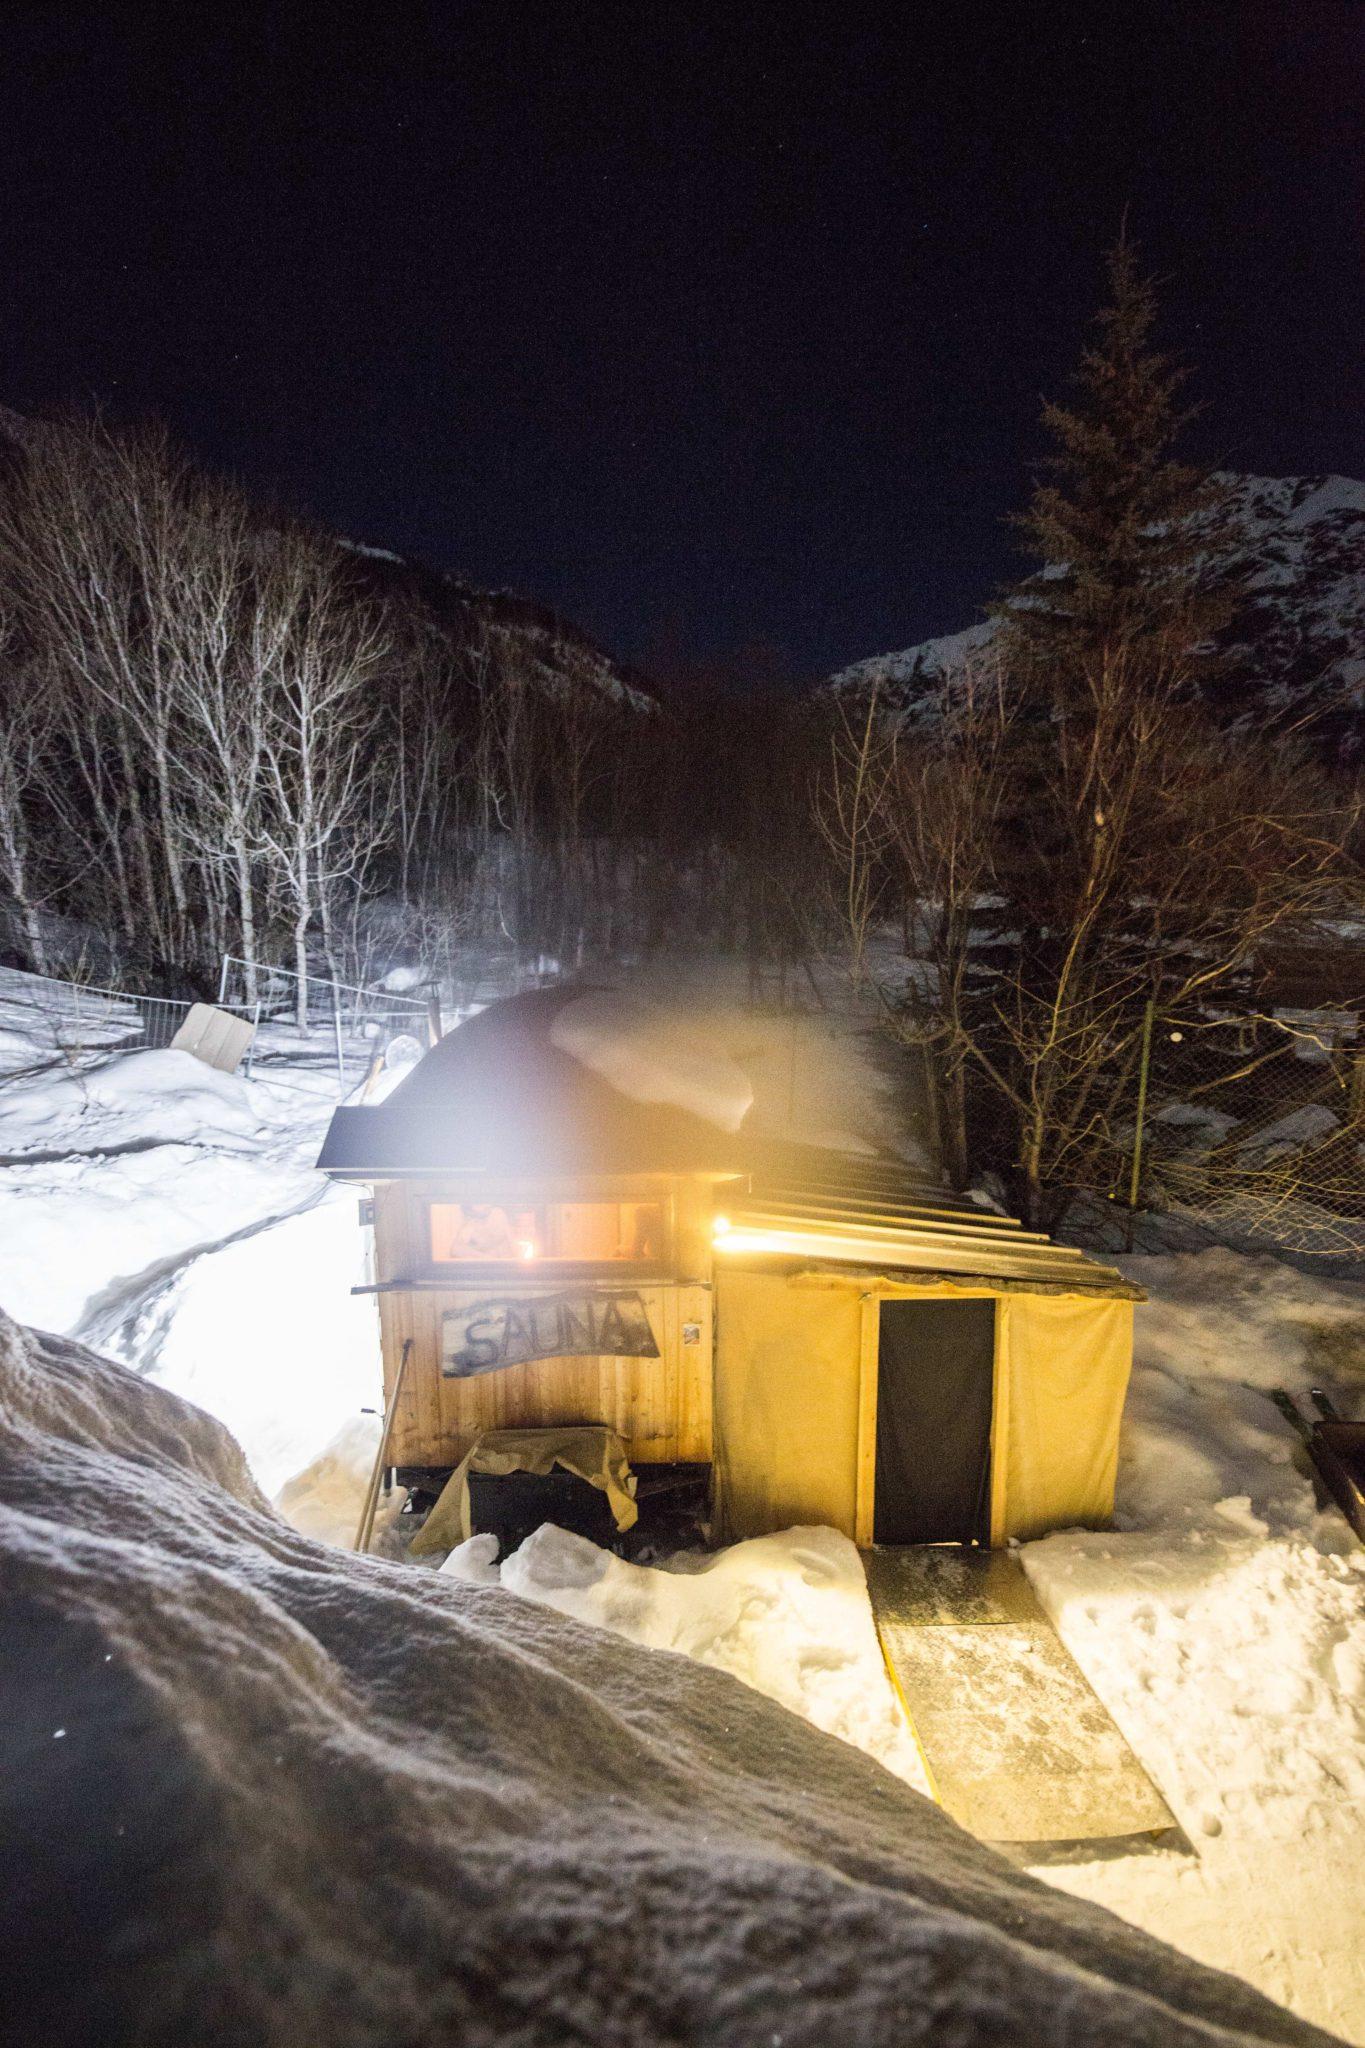 Sauna mobile Pelvoux